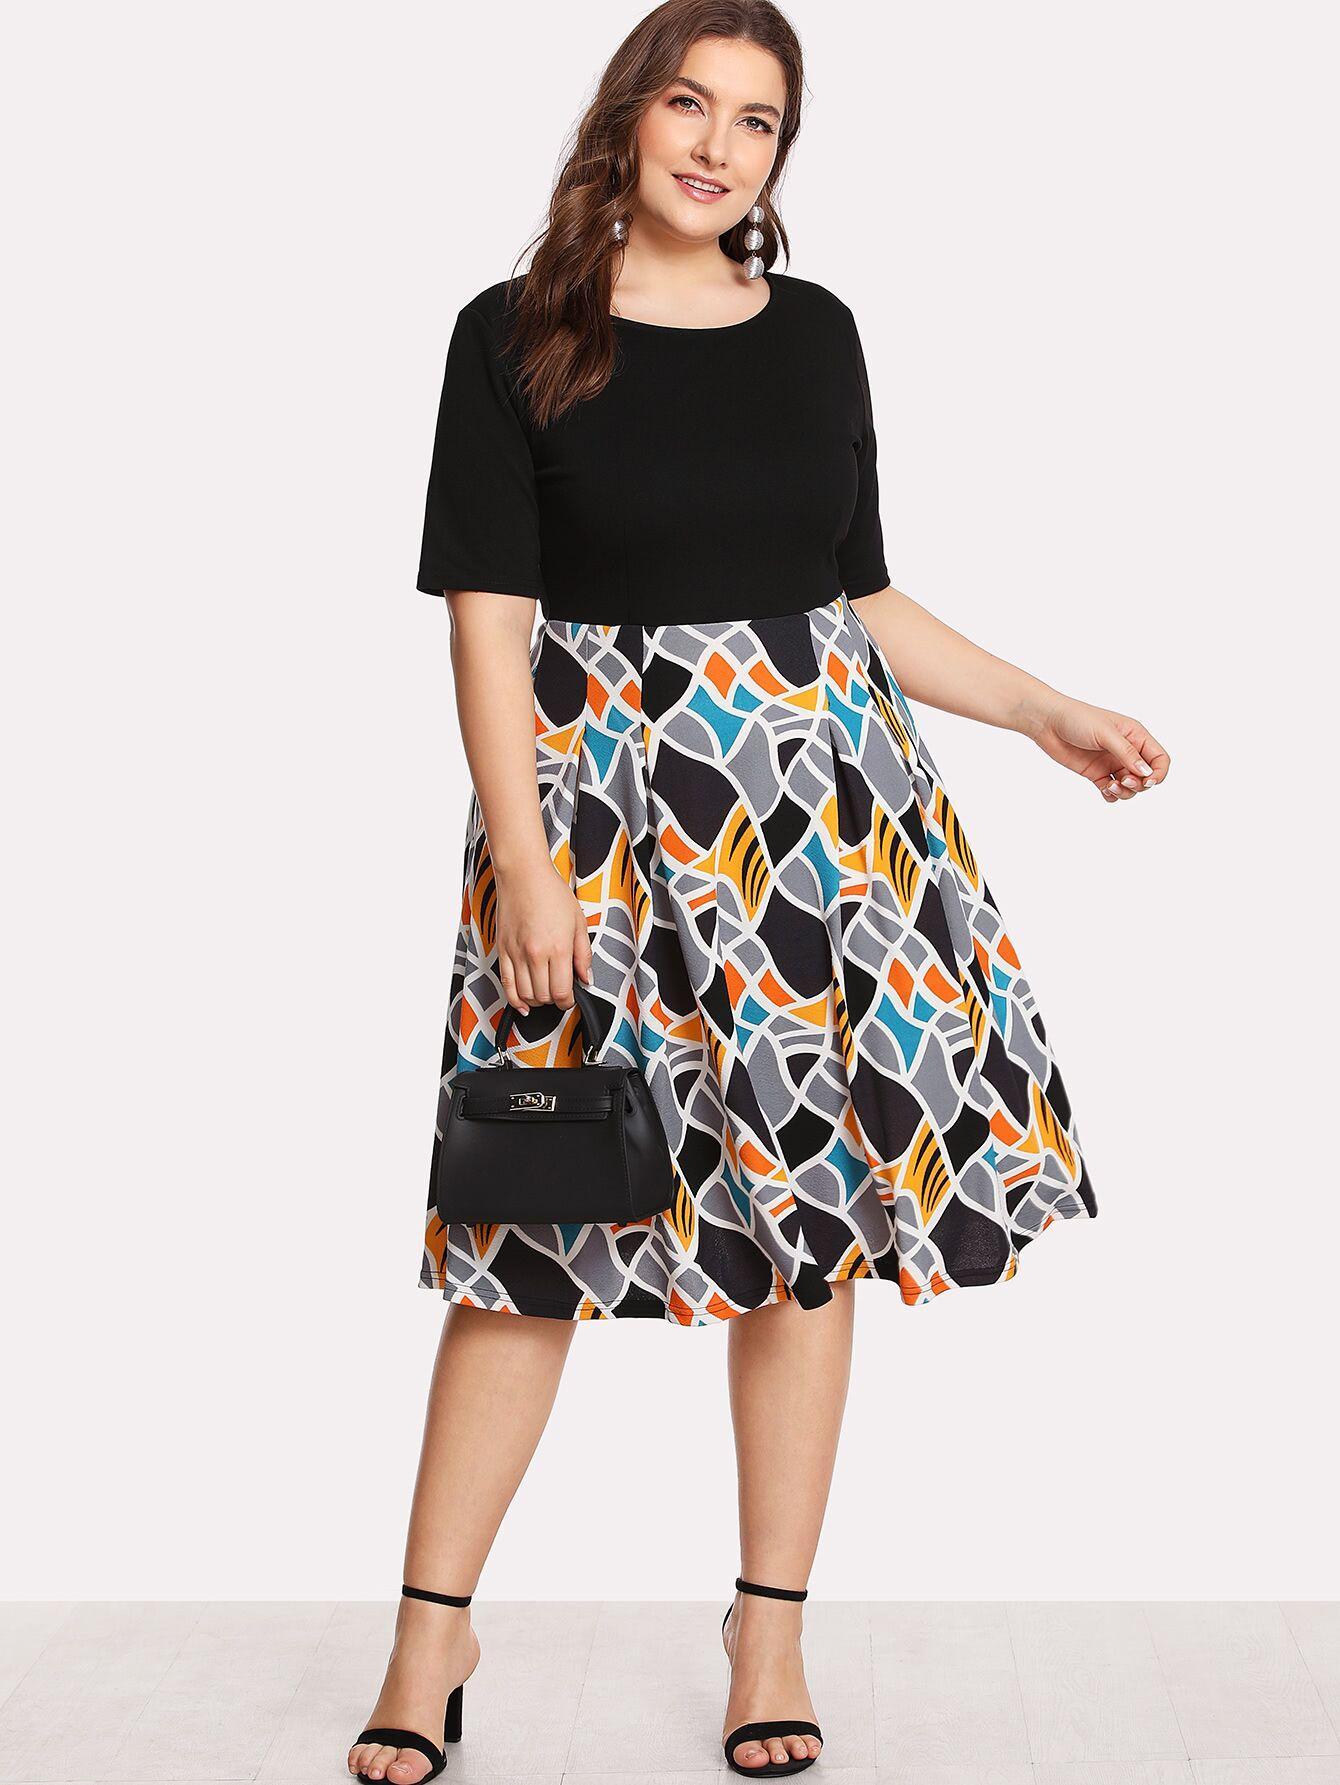 1deff6d4488b7 #A1966 Combined Plus Size Dress XL (XXL) XXXL